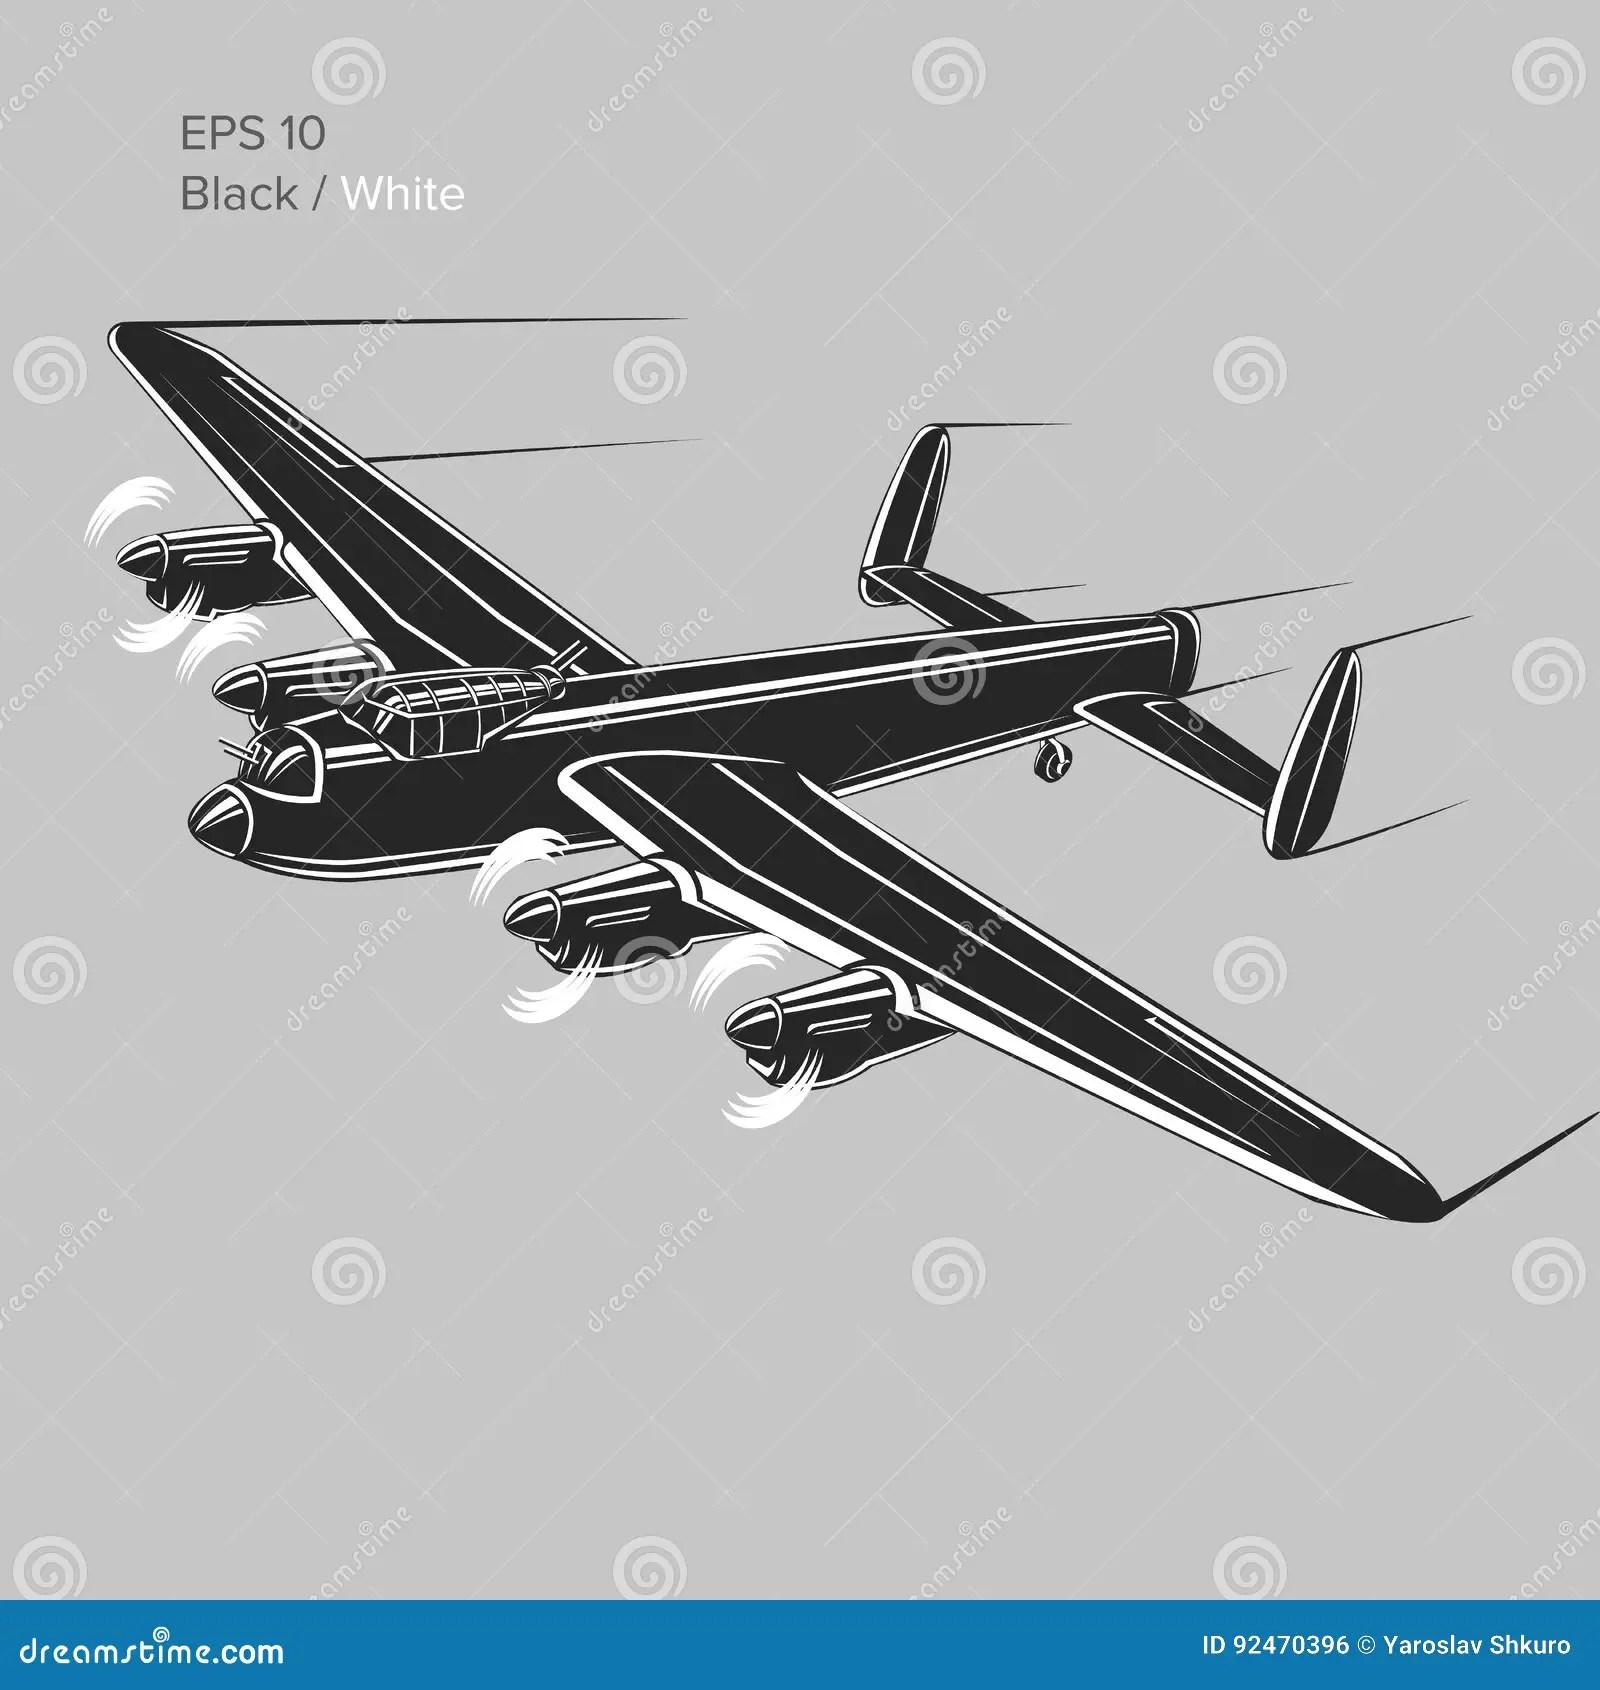 Vintageer Vector Ww2 Heavy Military Aircraft